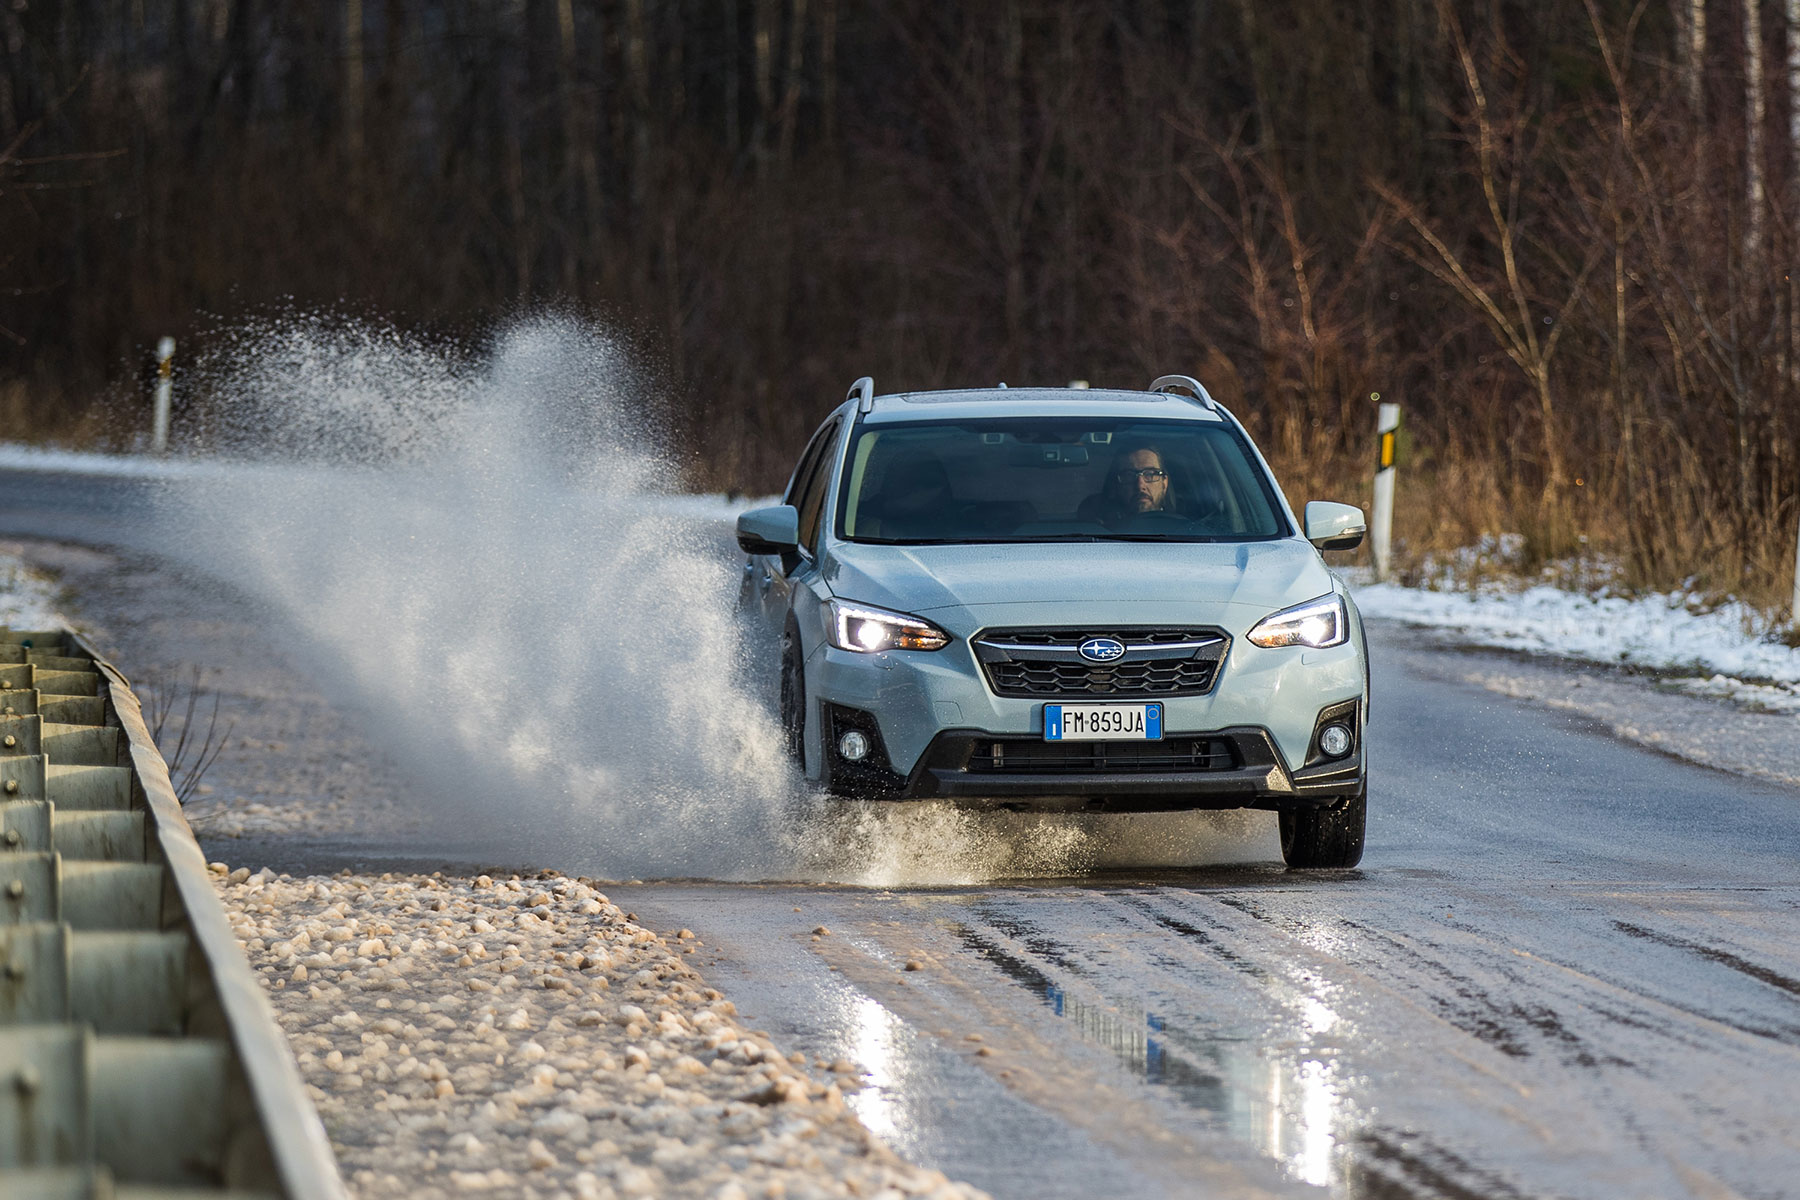 2018 Subaru XV first drive: a budget Land Rover alternative